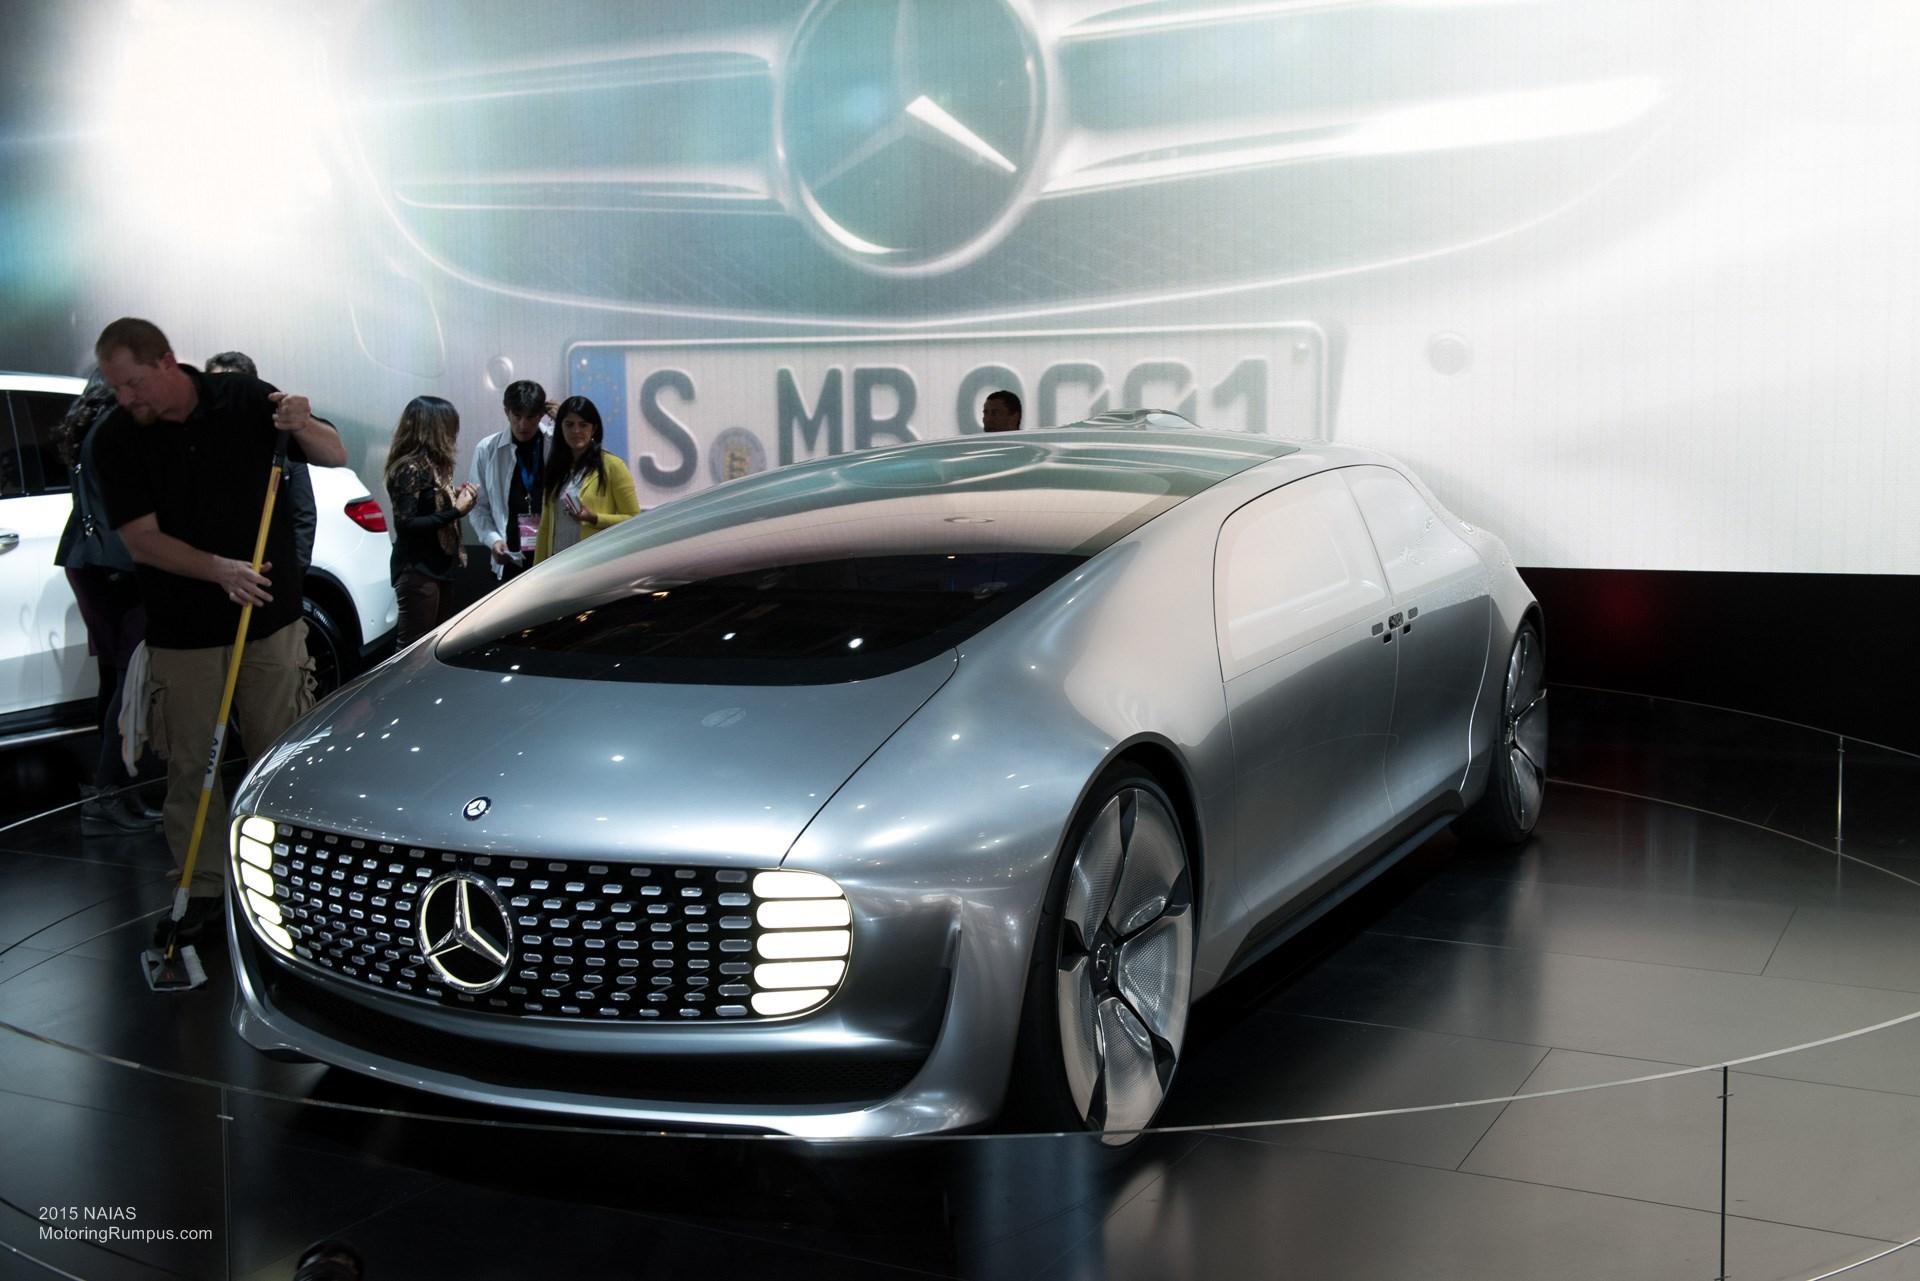 2015 NAIAS Mercedes-Benz F 015